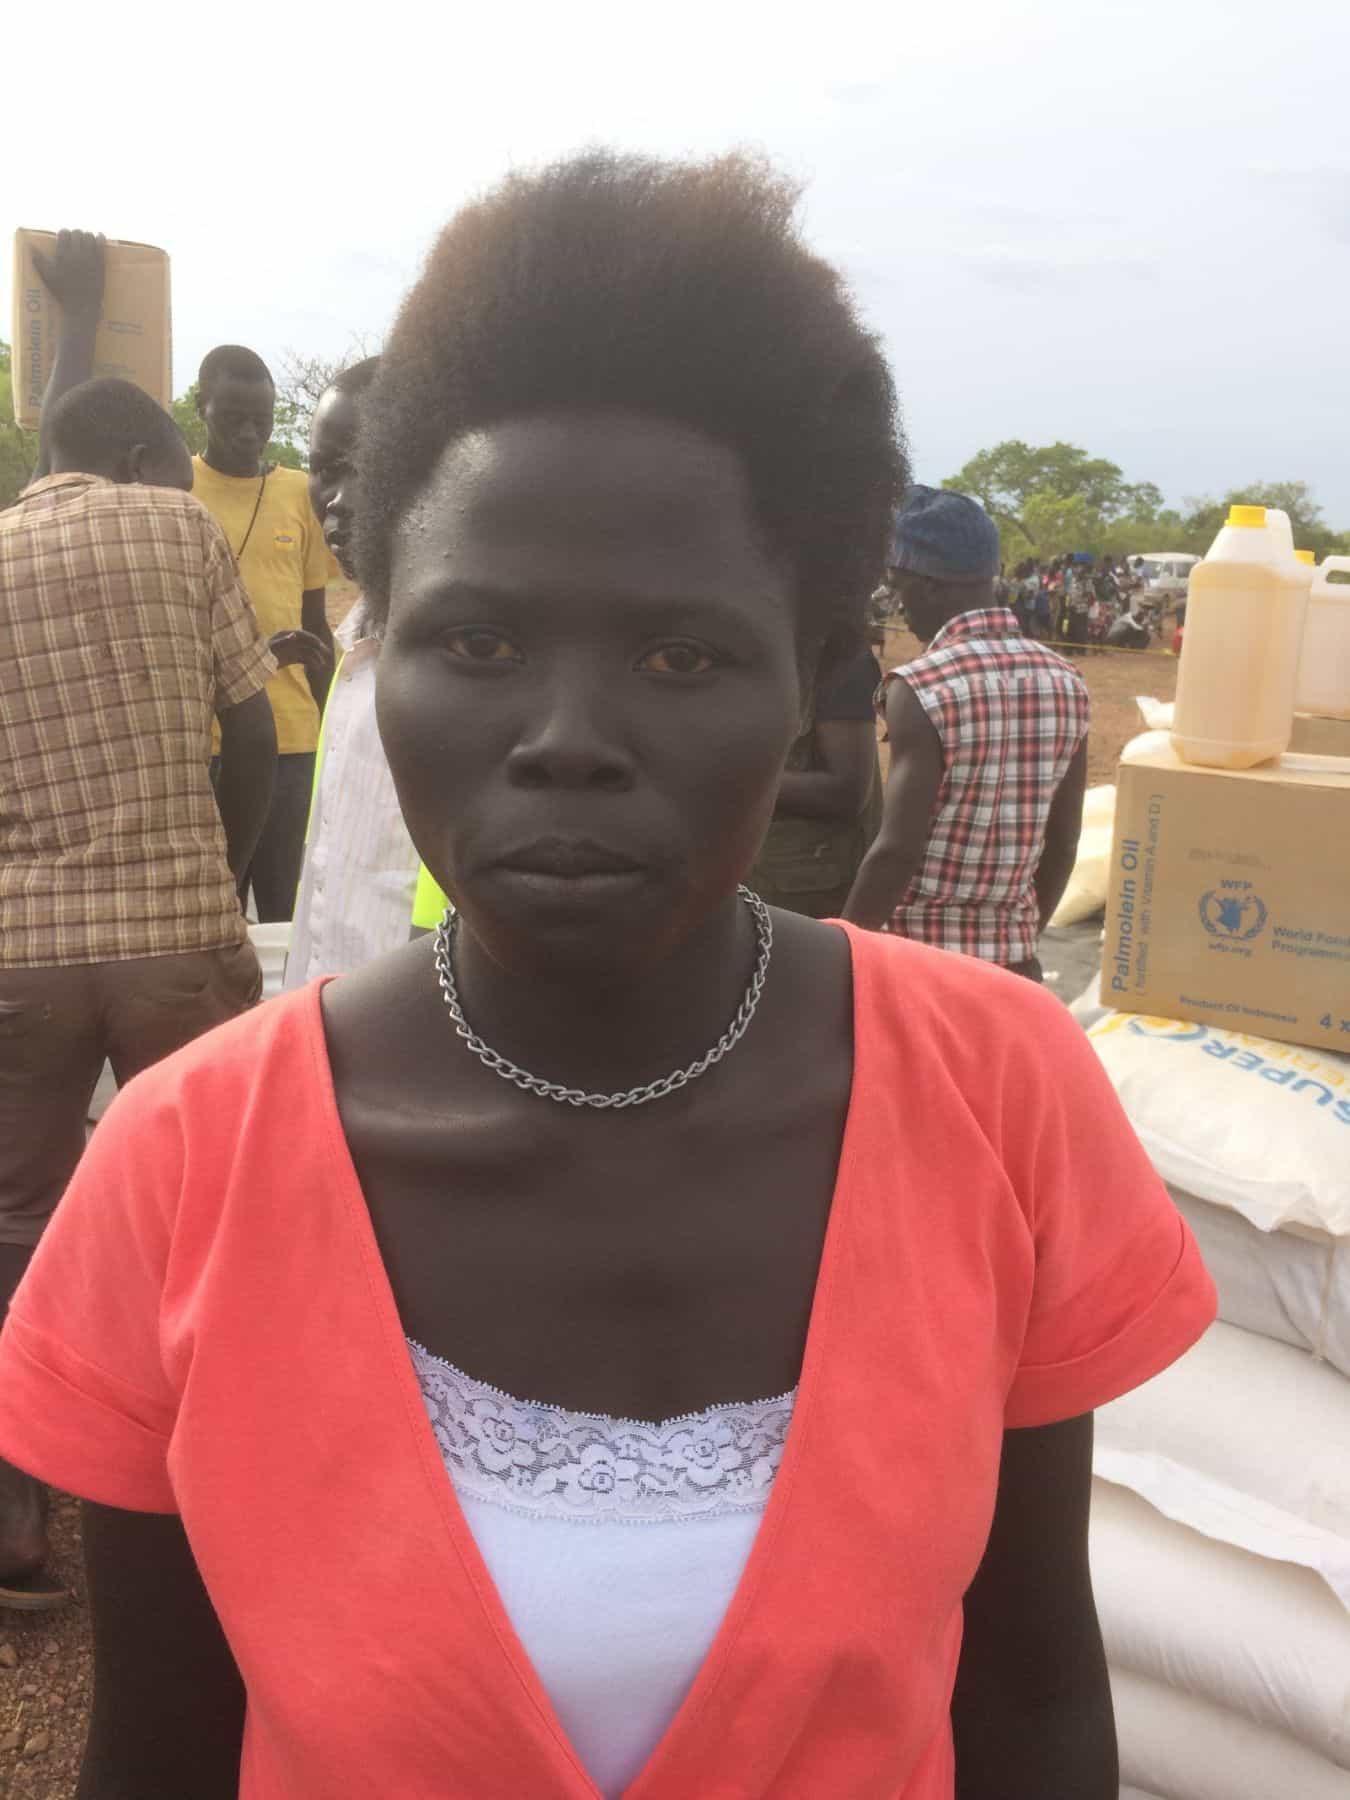 Samaritan's Purse, Uganda government providing lifeline to traumatized South Sudan refugees